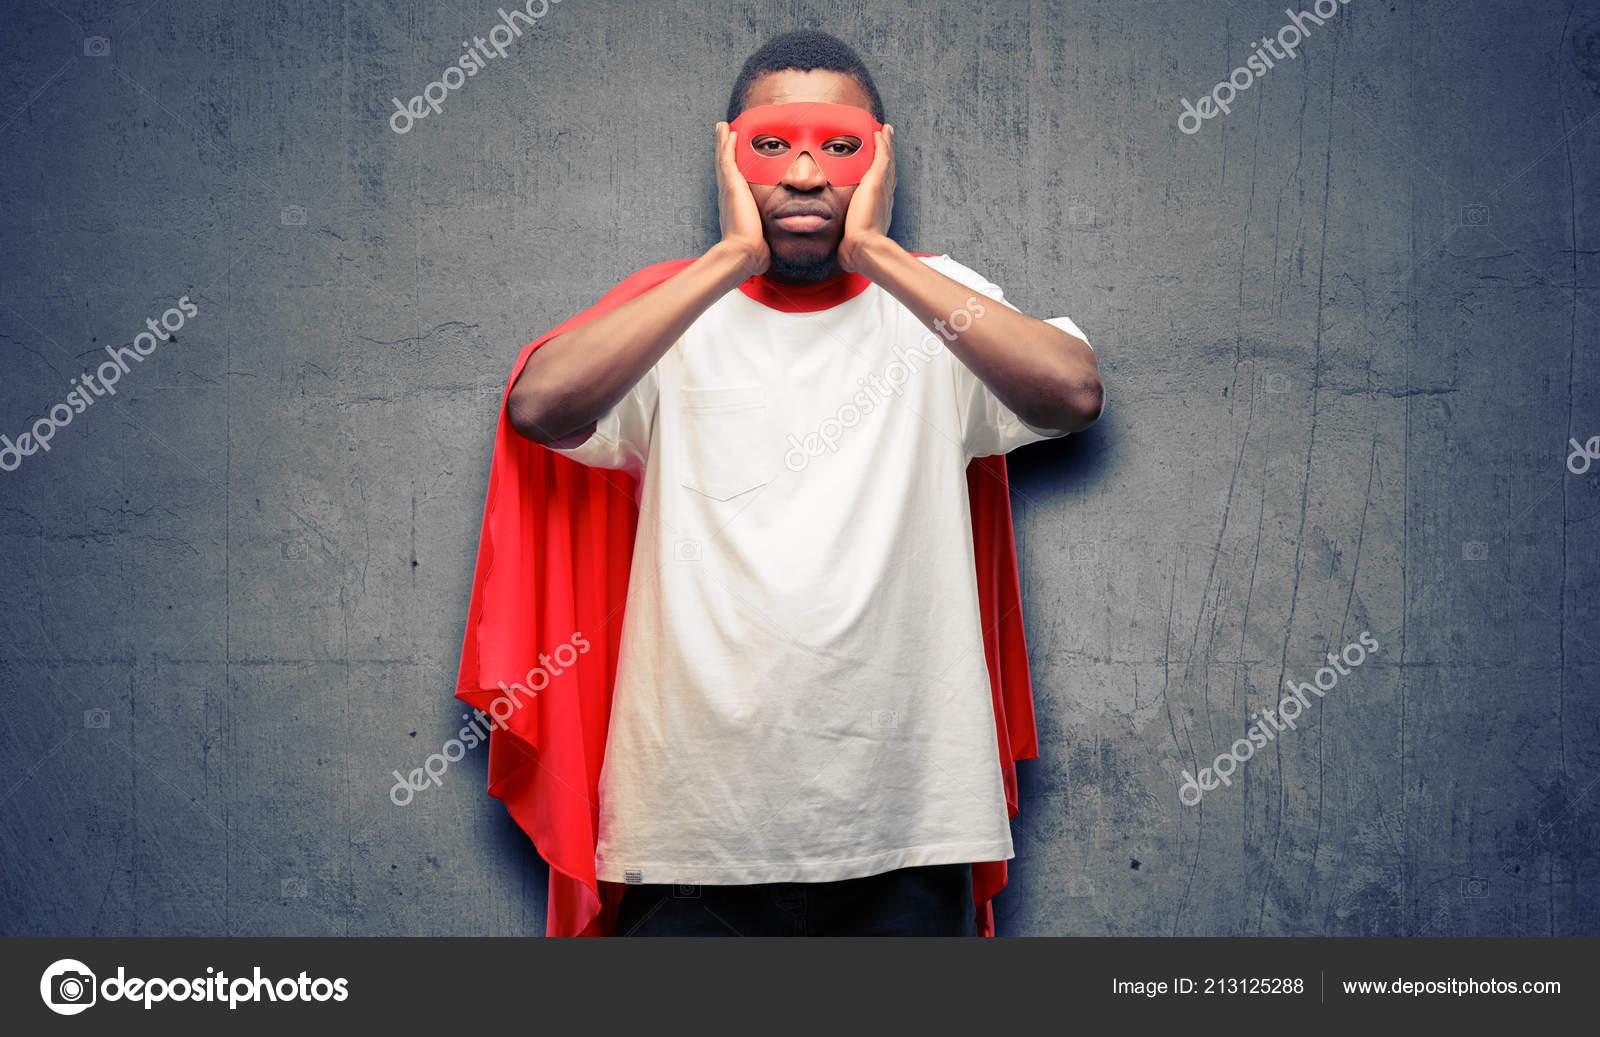 African Black Super Hero Man Covering Ears Ignoring Annoying Loud